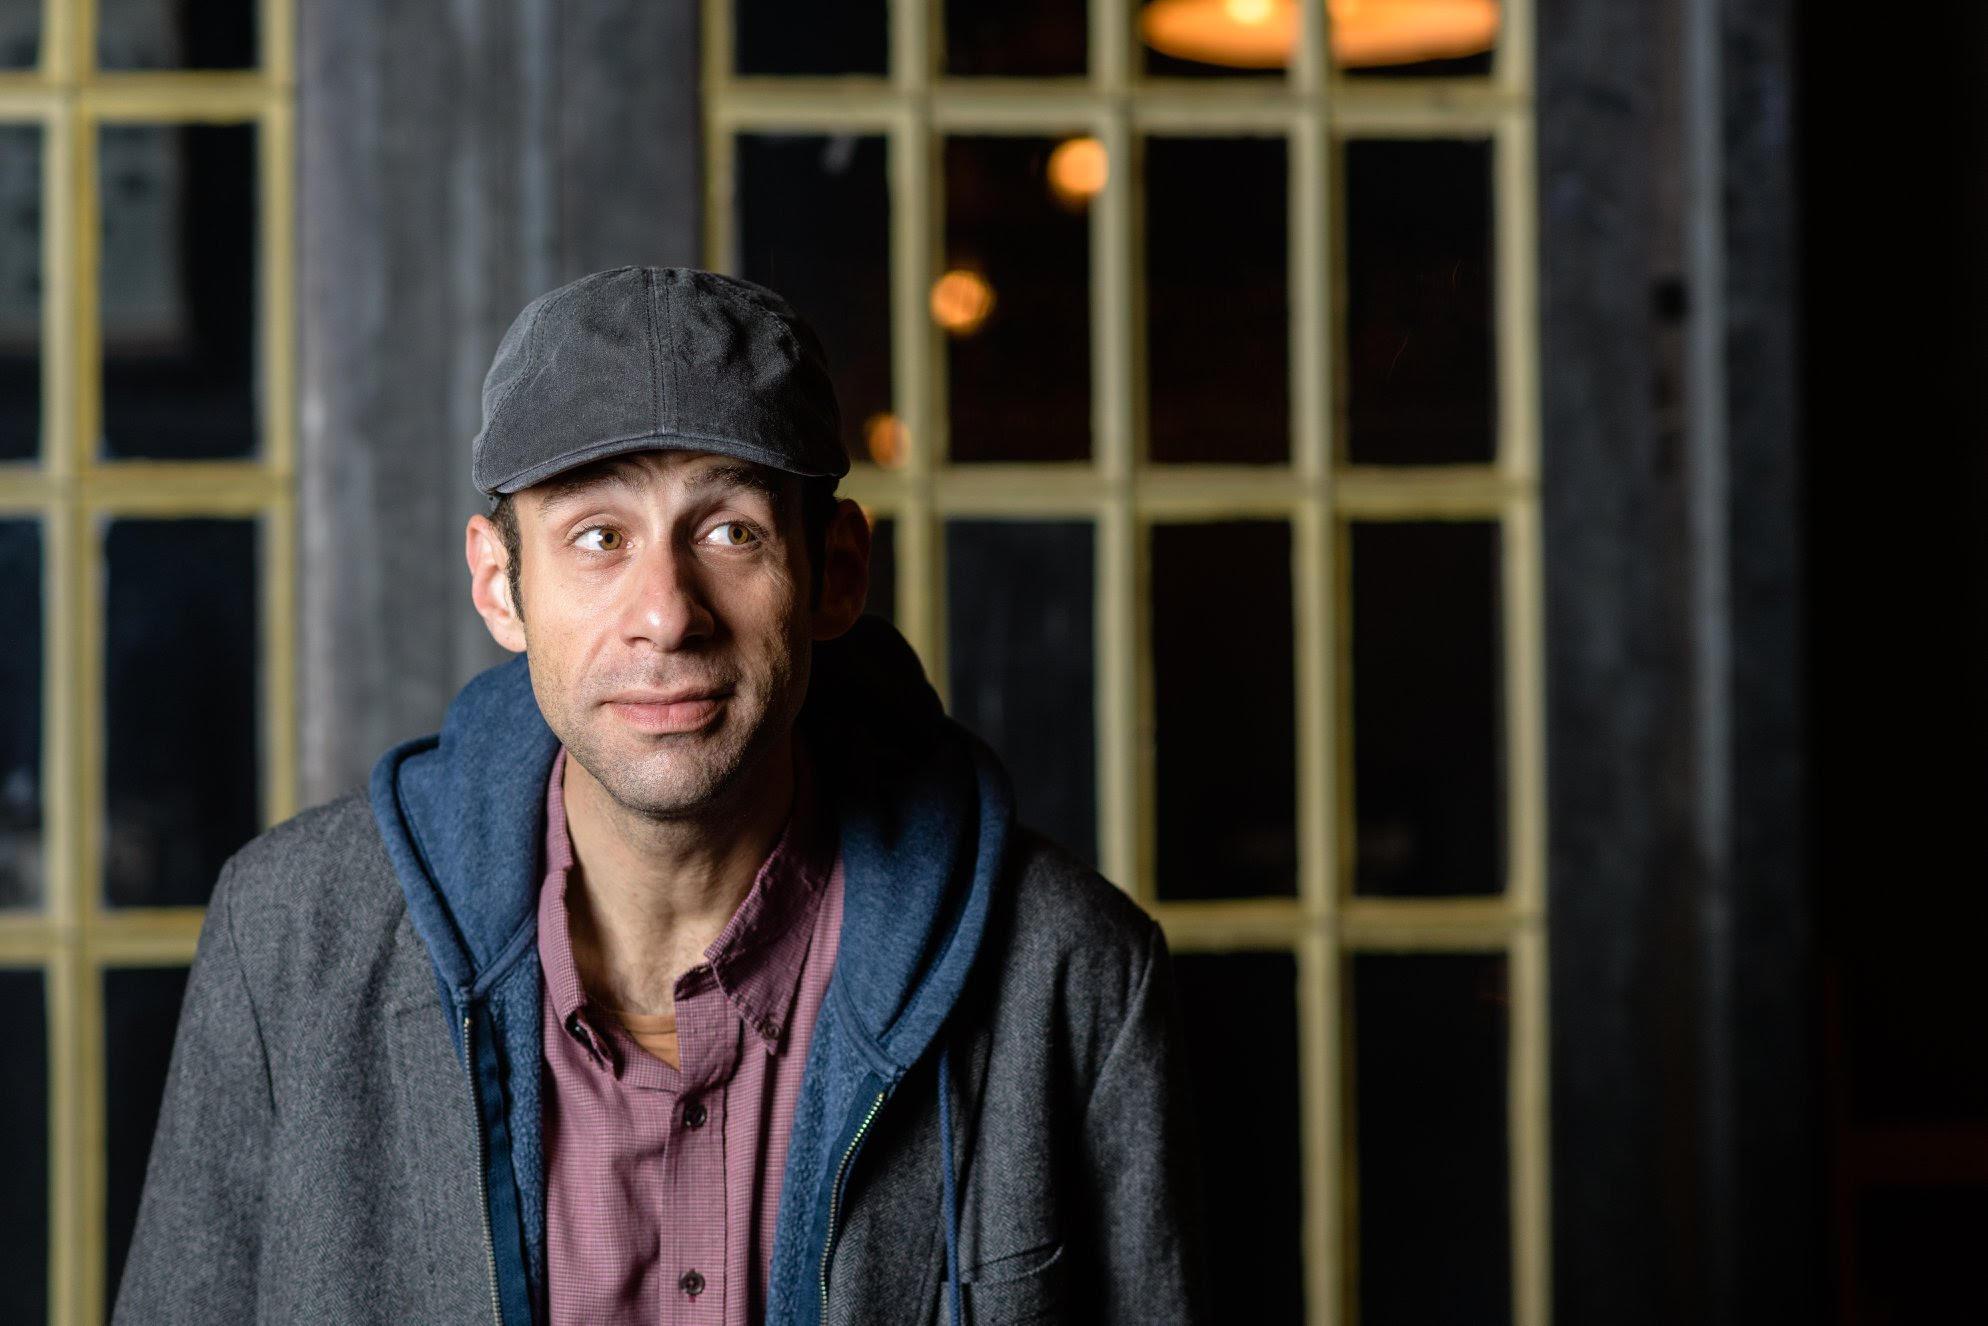 Comedian Adam Gabel